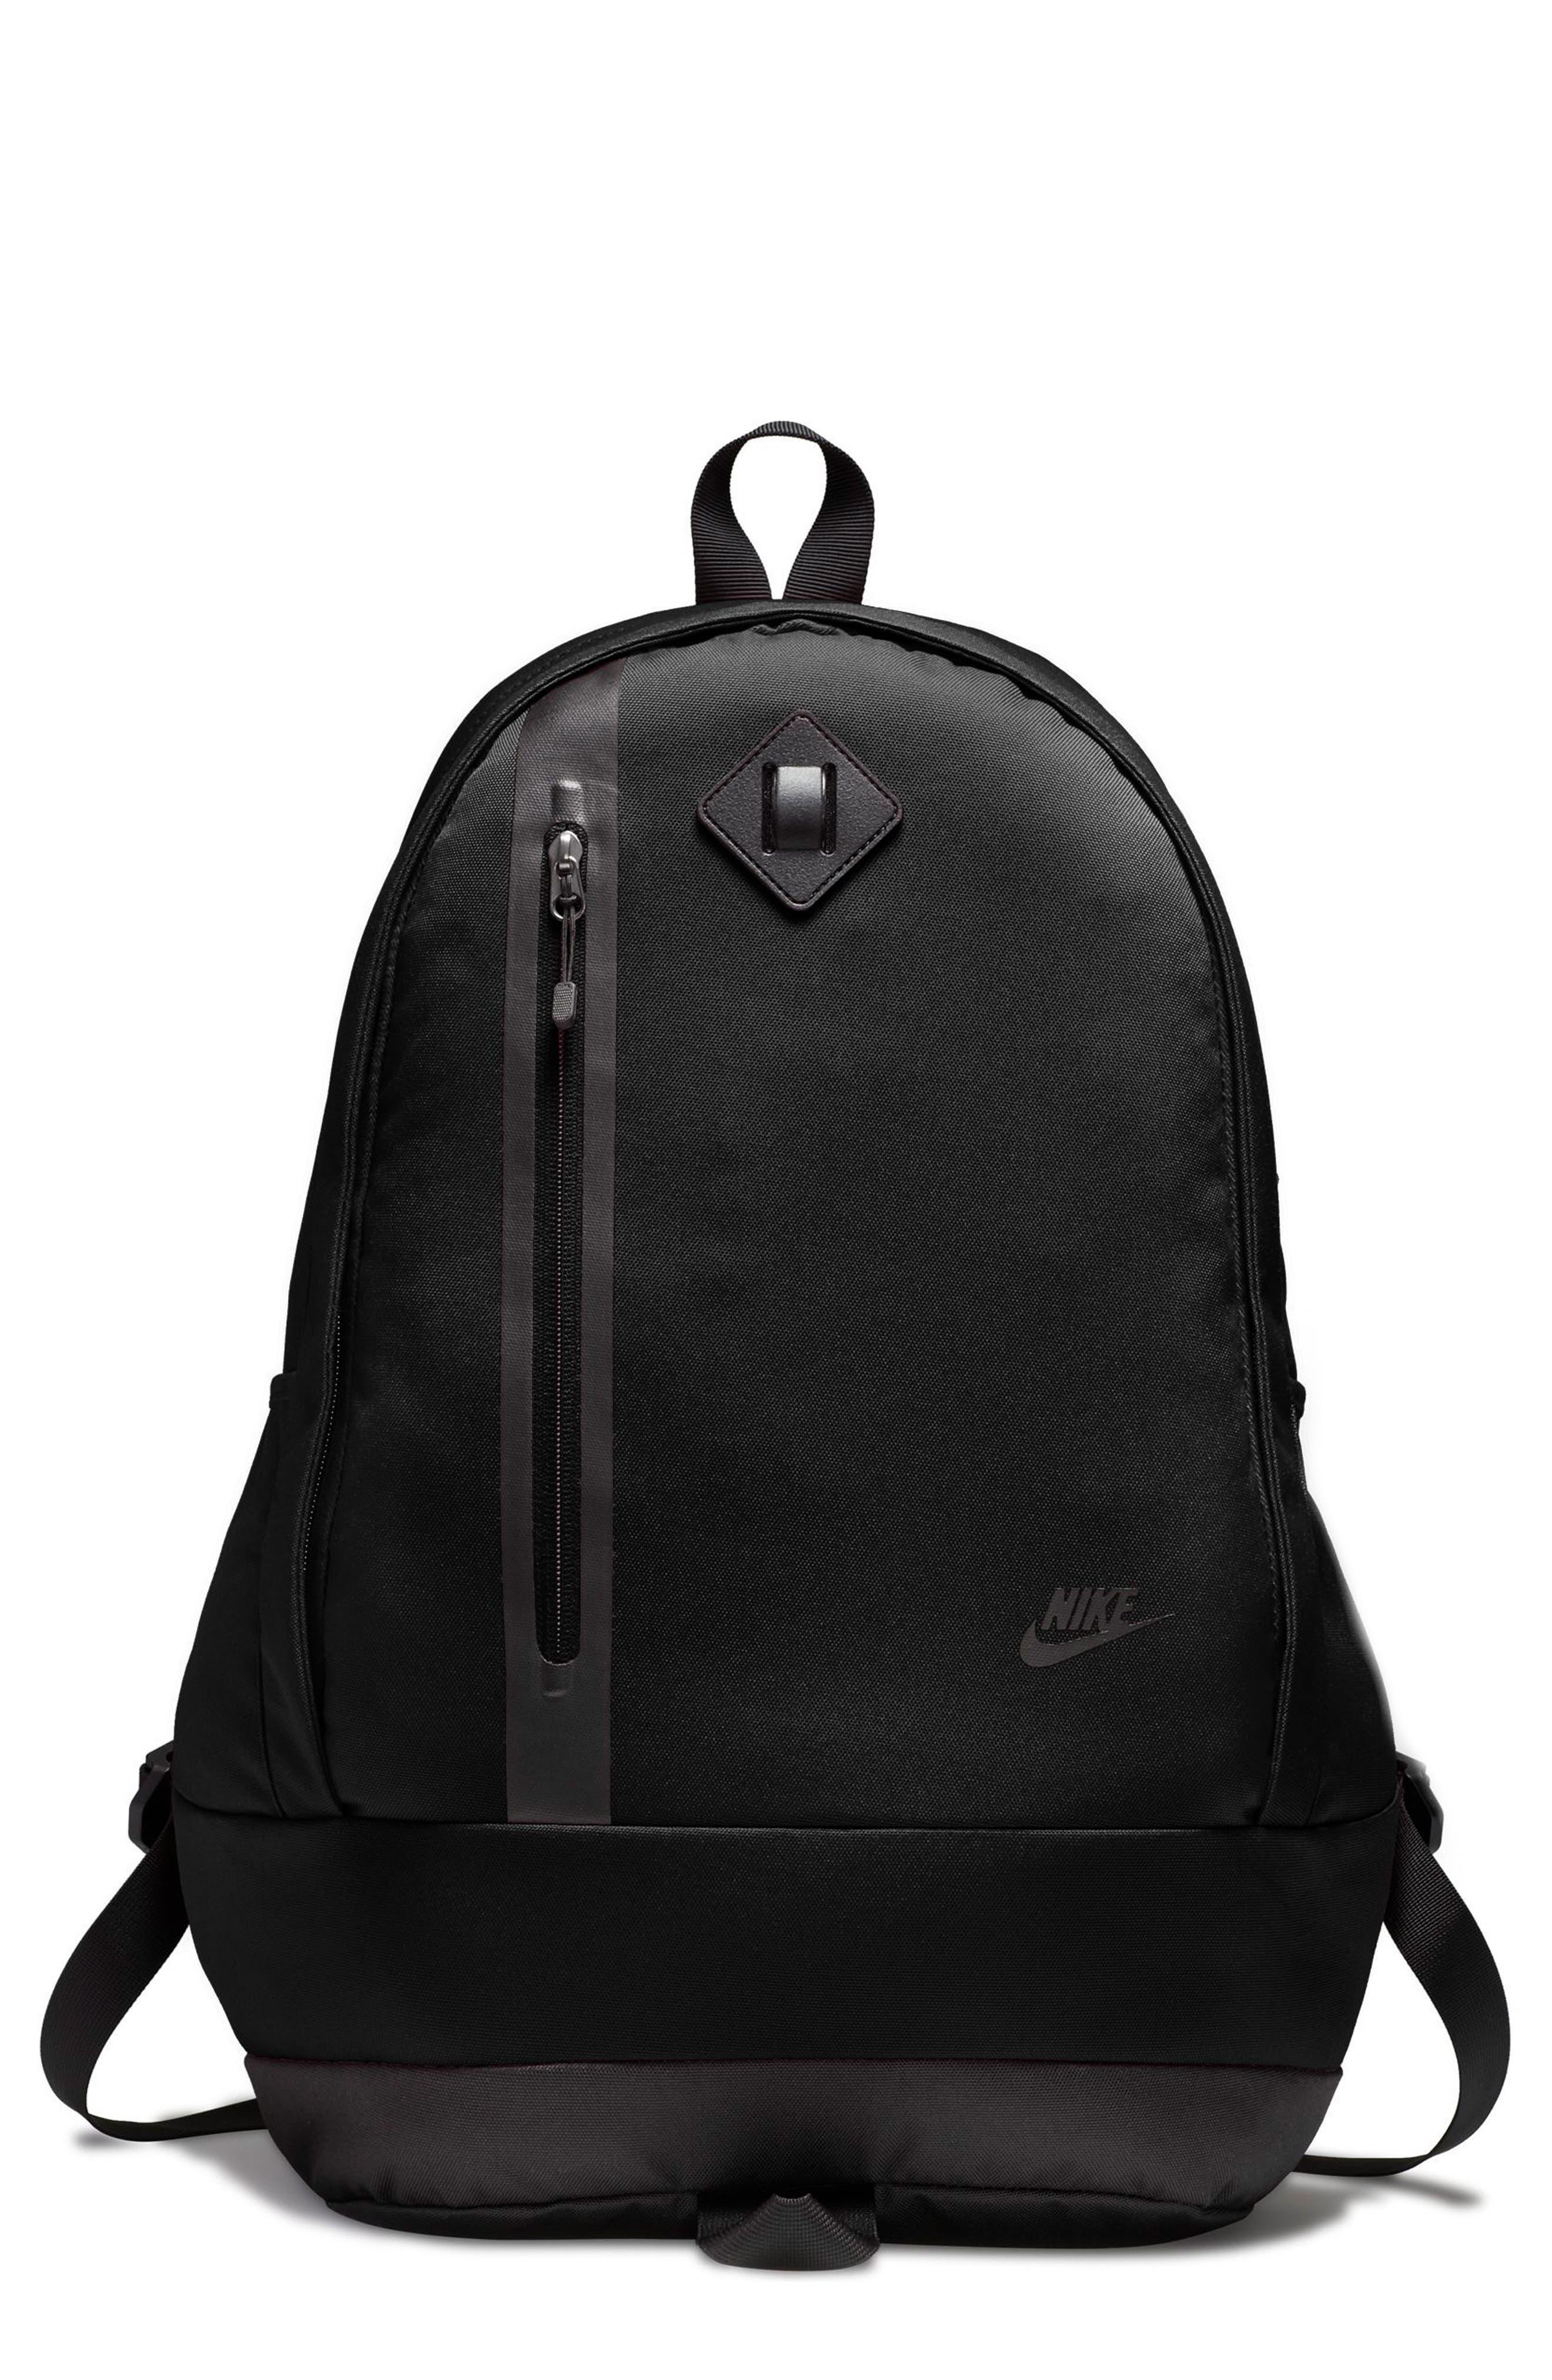 Cheyenne Backpack,                         Main,                         color, Black/ Black/ Black